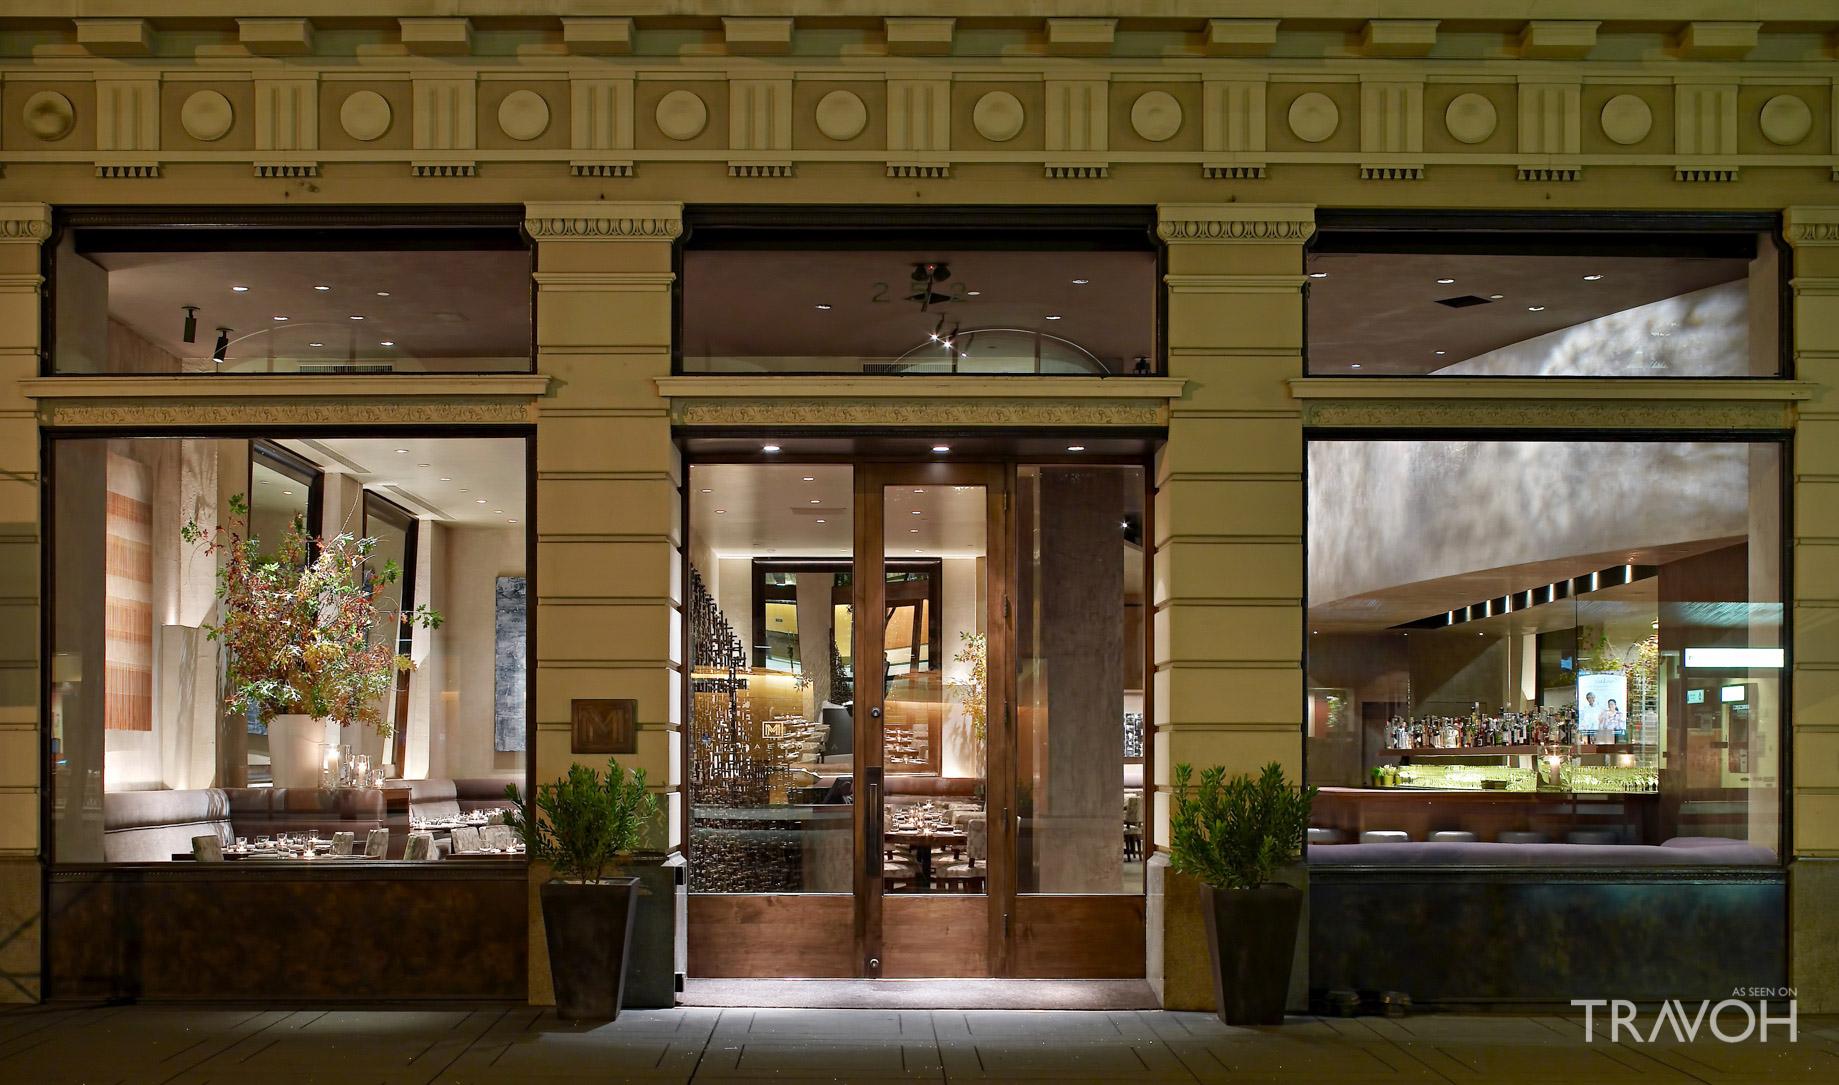 Michael Mina Restaurant - 252 California St, San Francisco, CA, USA